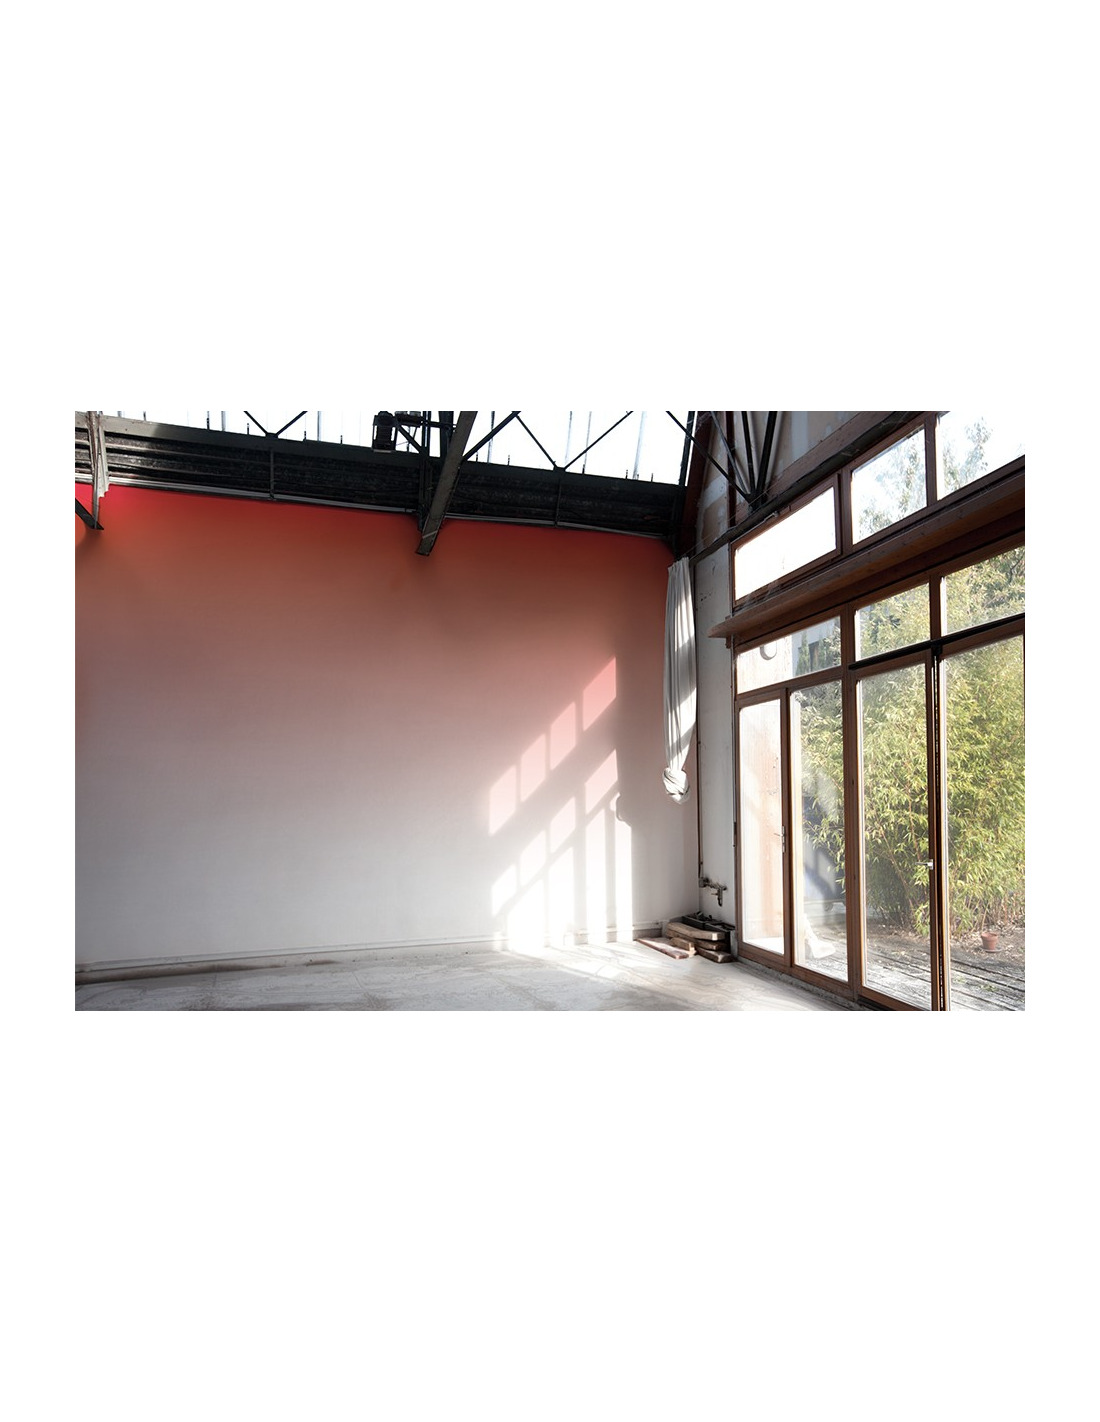 papier peint design intiss sunset grenadine pr t poser by a a cooren otoko. Black Bedroom Furniture Sets. Home Design Ideas